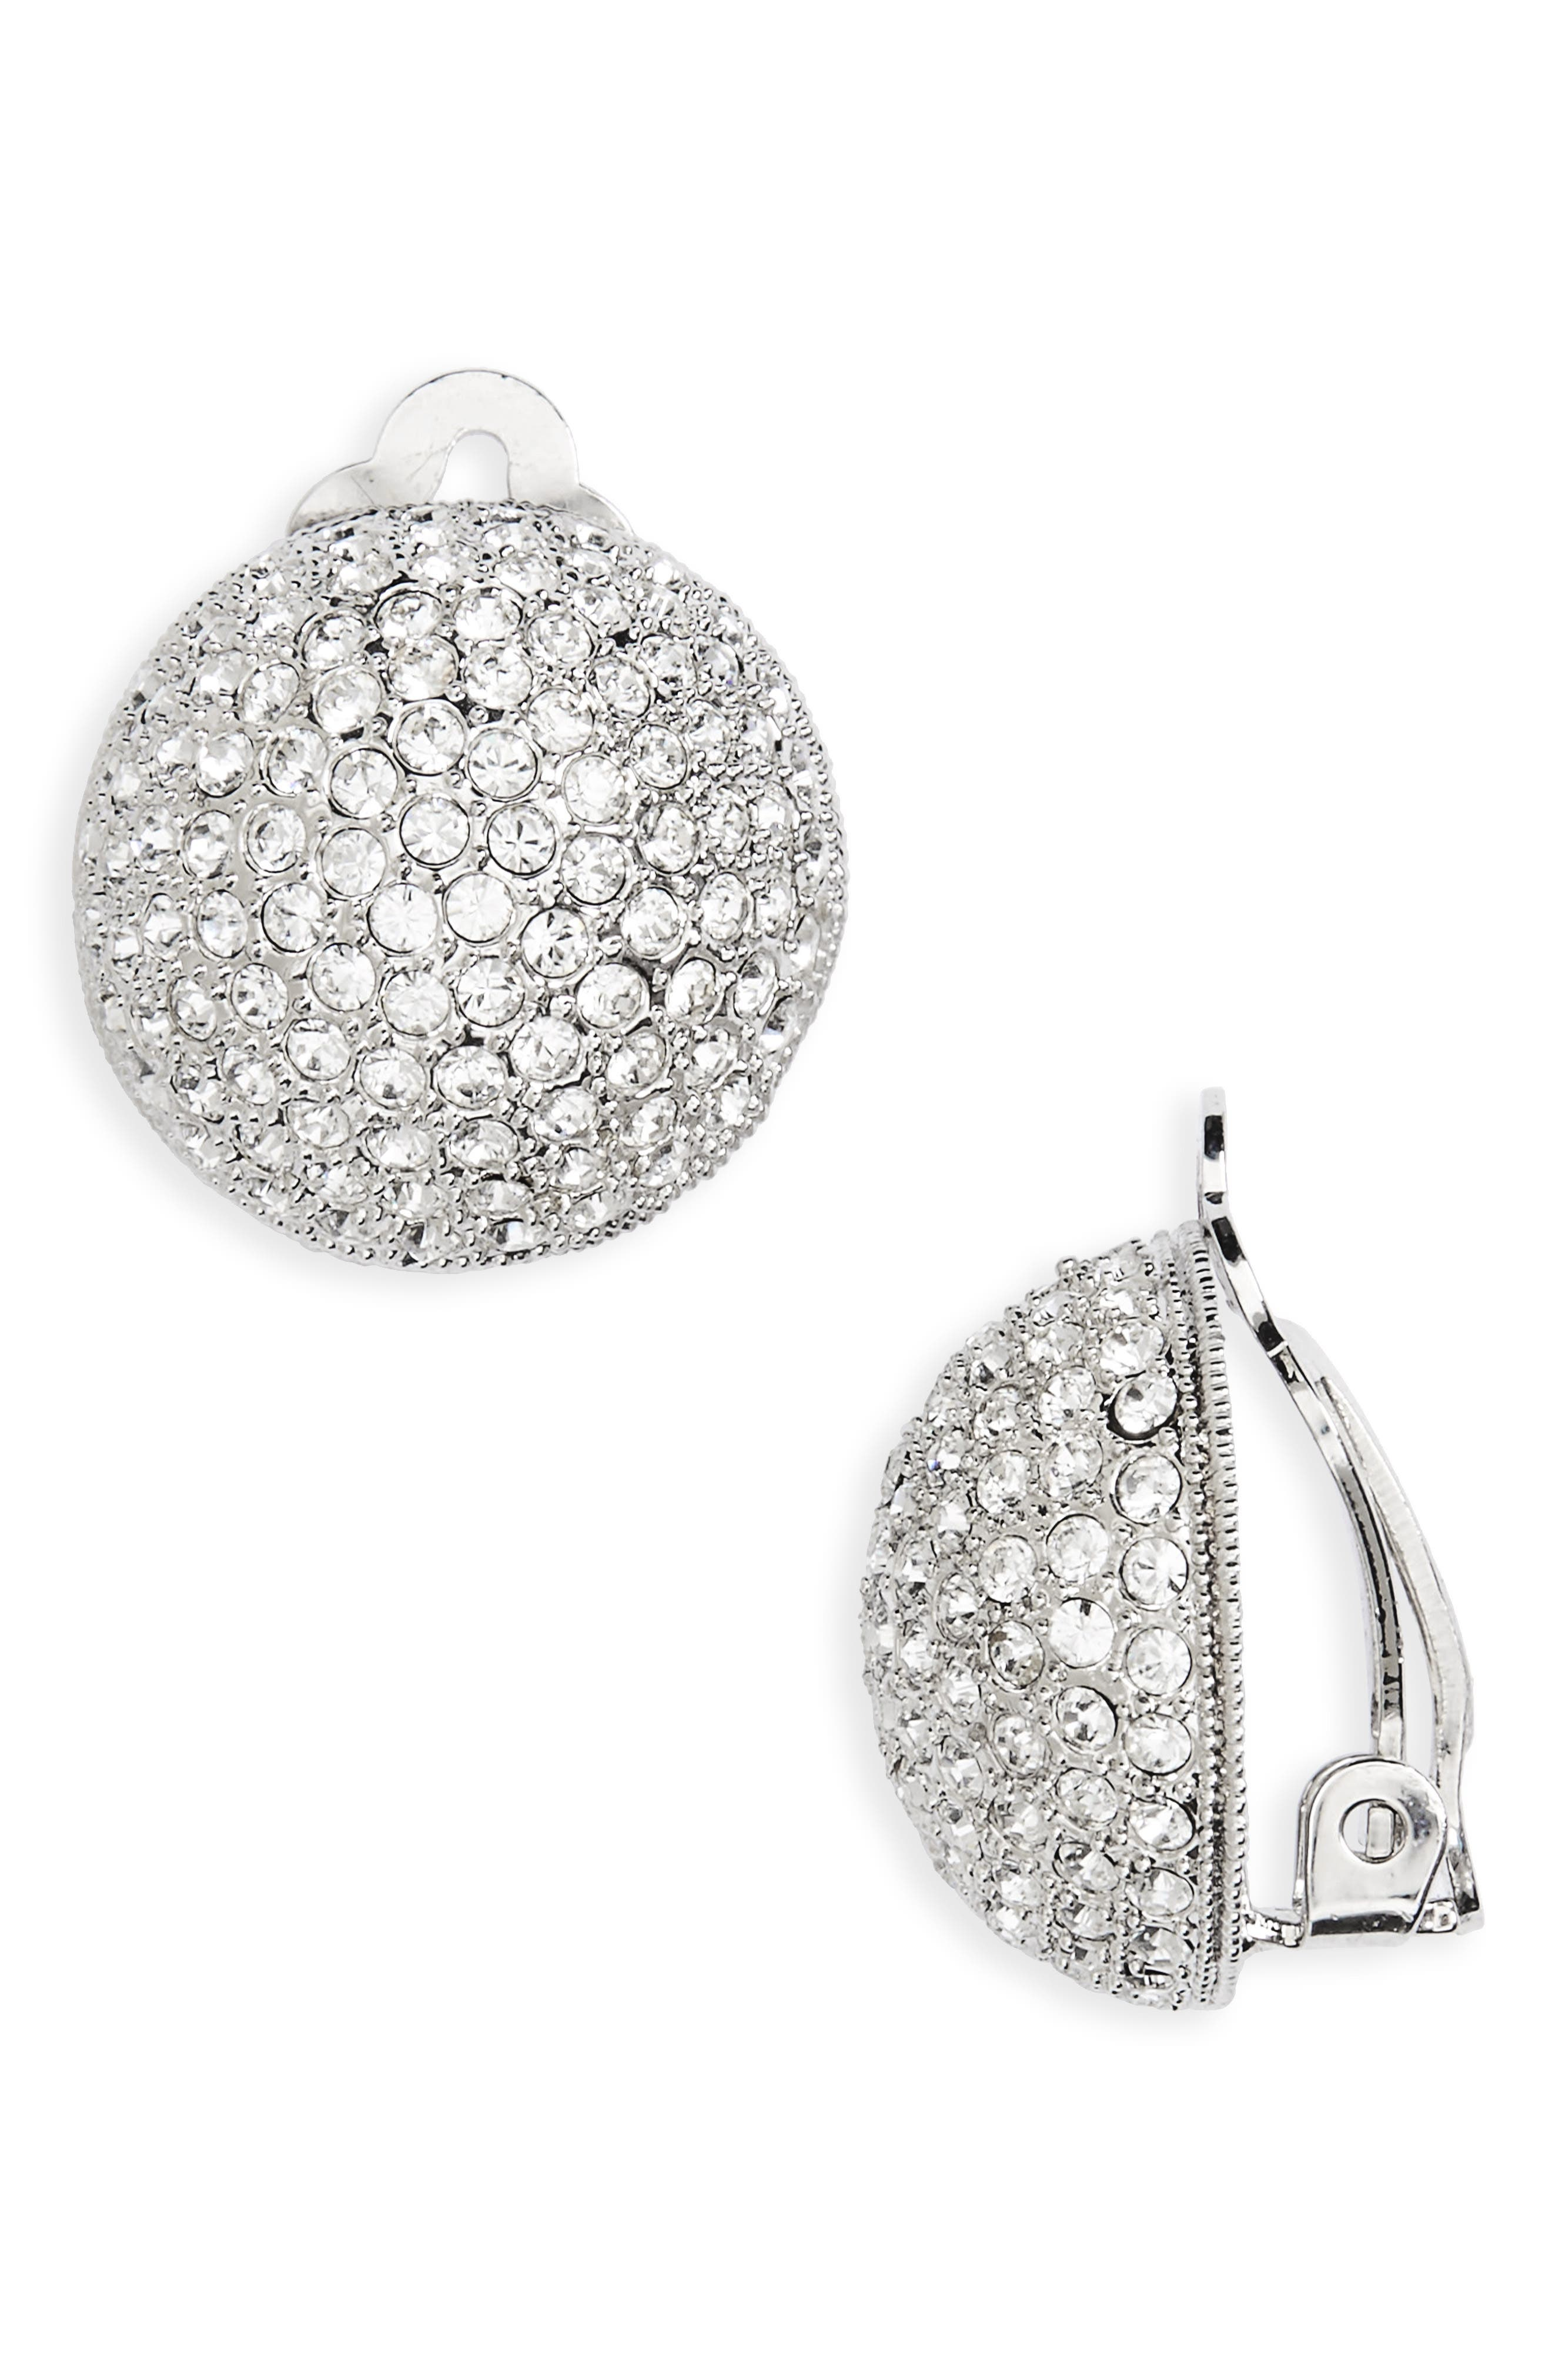 Clip Swarovski Crystal Earrings,                         Main,                         color, SILVER